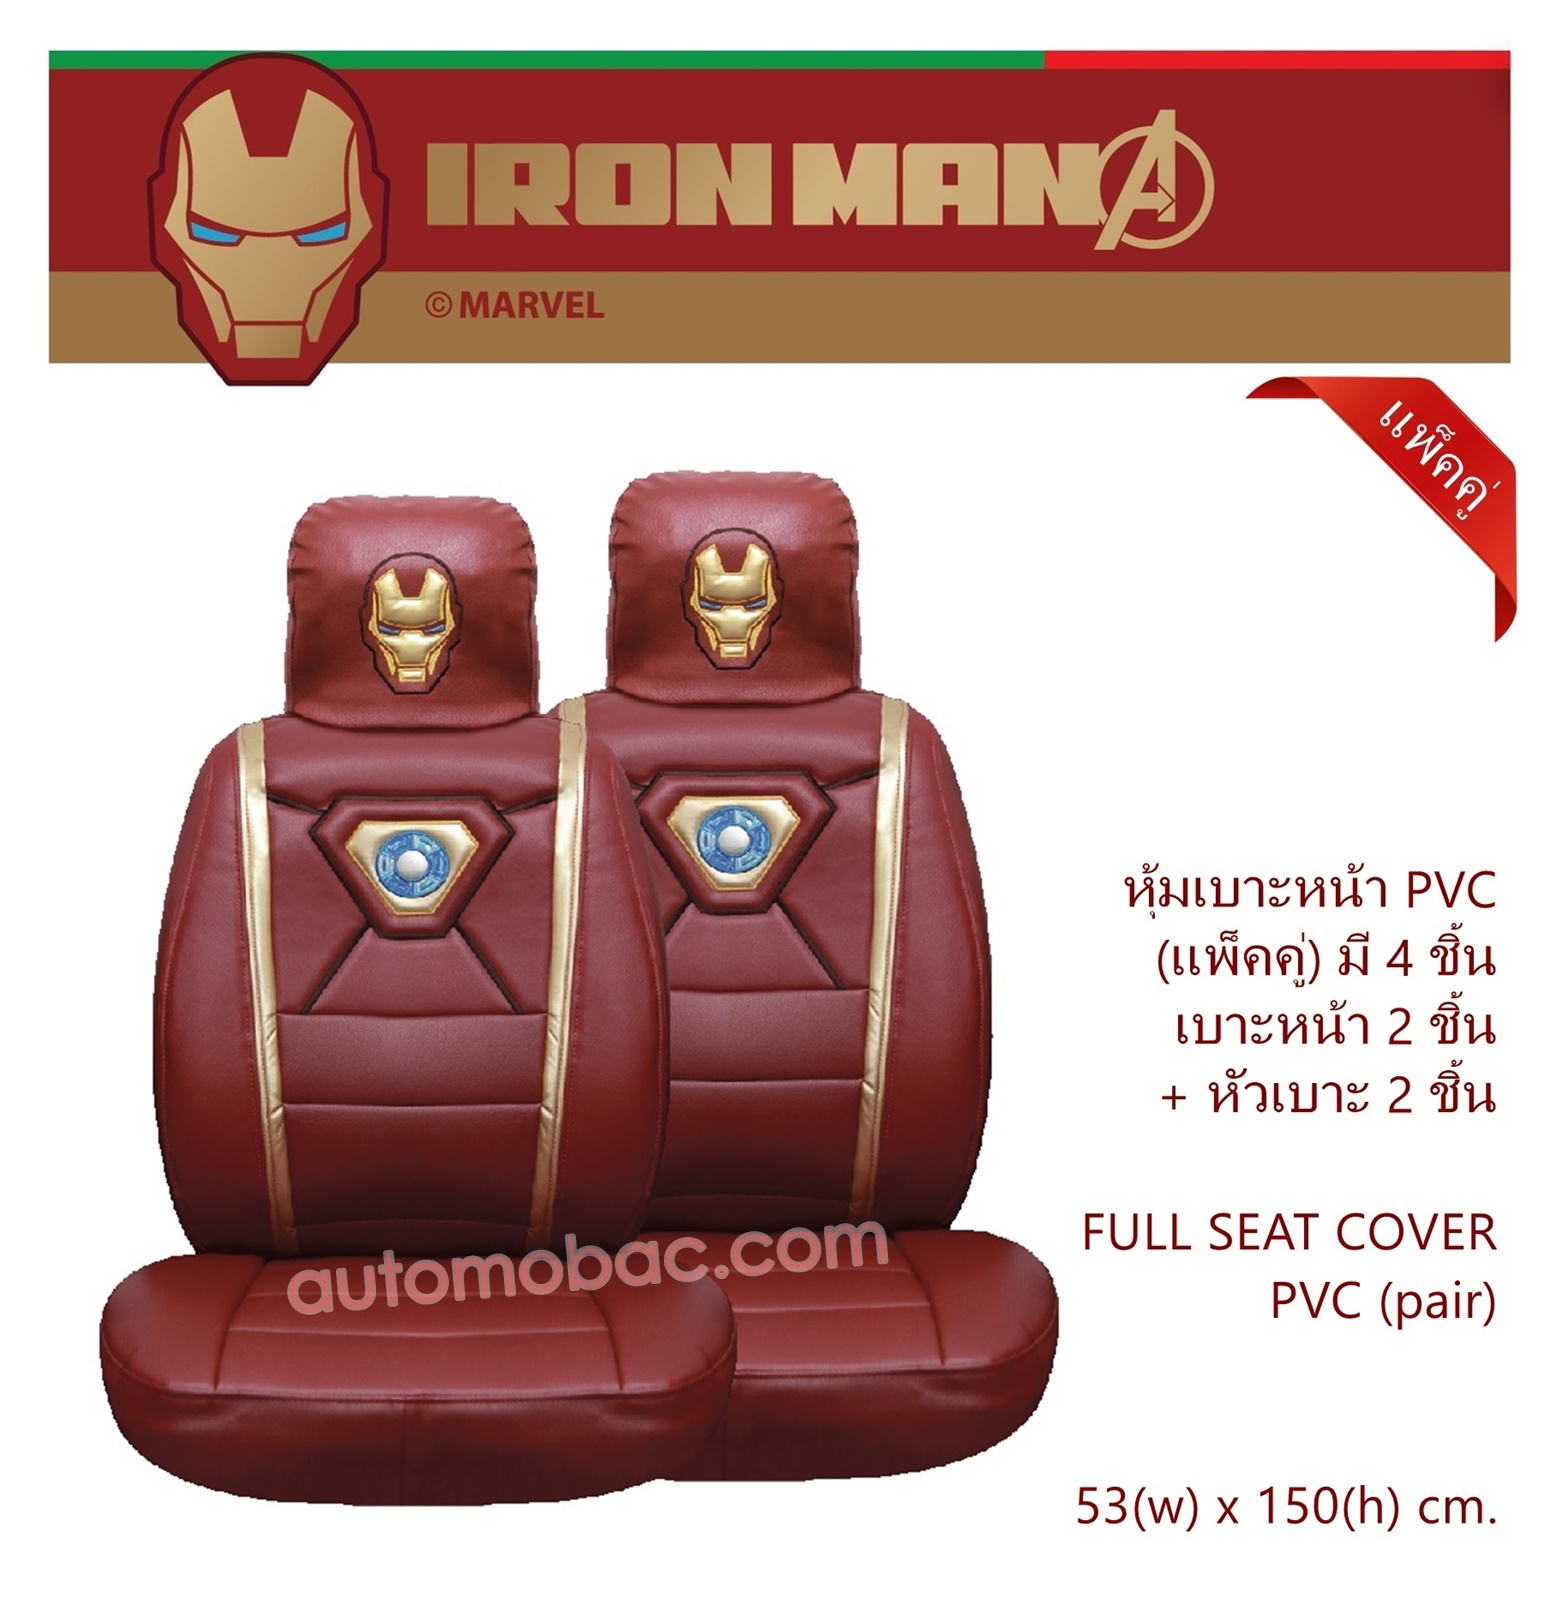 IRON-MAN ที่หุ้มเบาะคู่หน้าหนัง PVC แบบเรียบ แพ็คคู่ เบาะ 2 ชิ้น หัวเบาะ 2 ชิ้น ลิขสิทธ์แท้